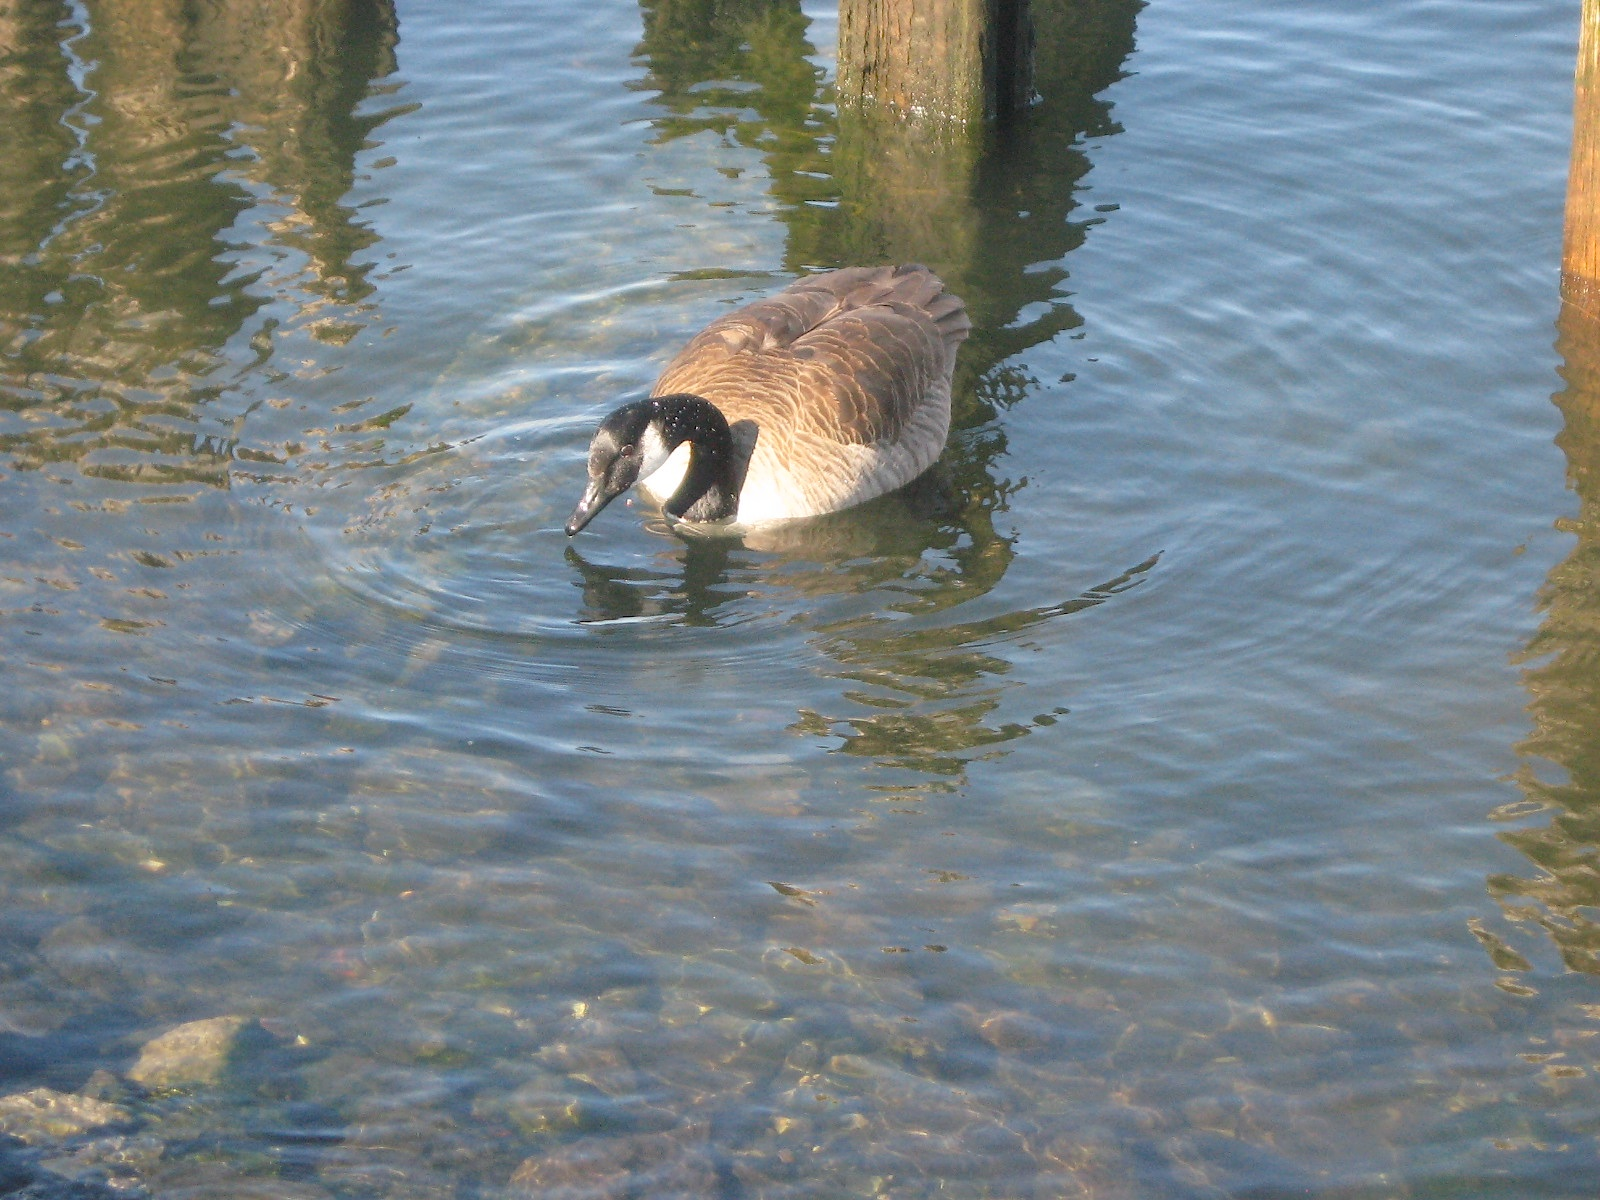 JFries - Canada goose, Charlestown, 2.11.19